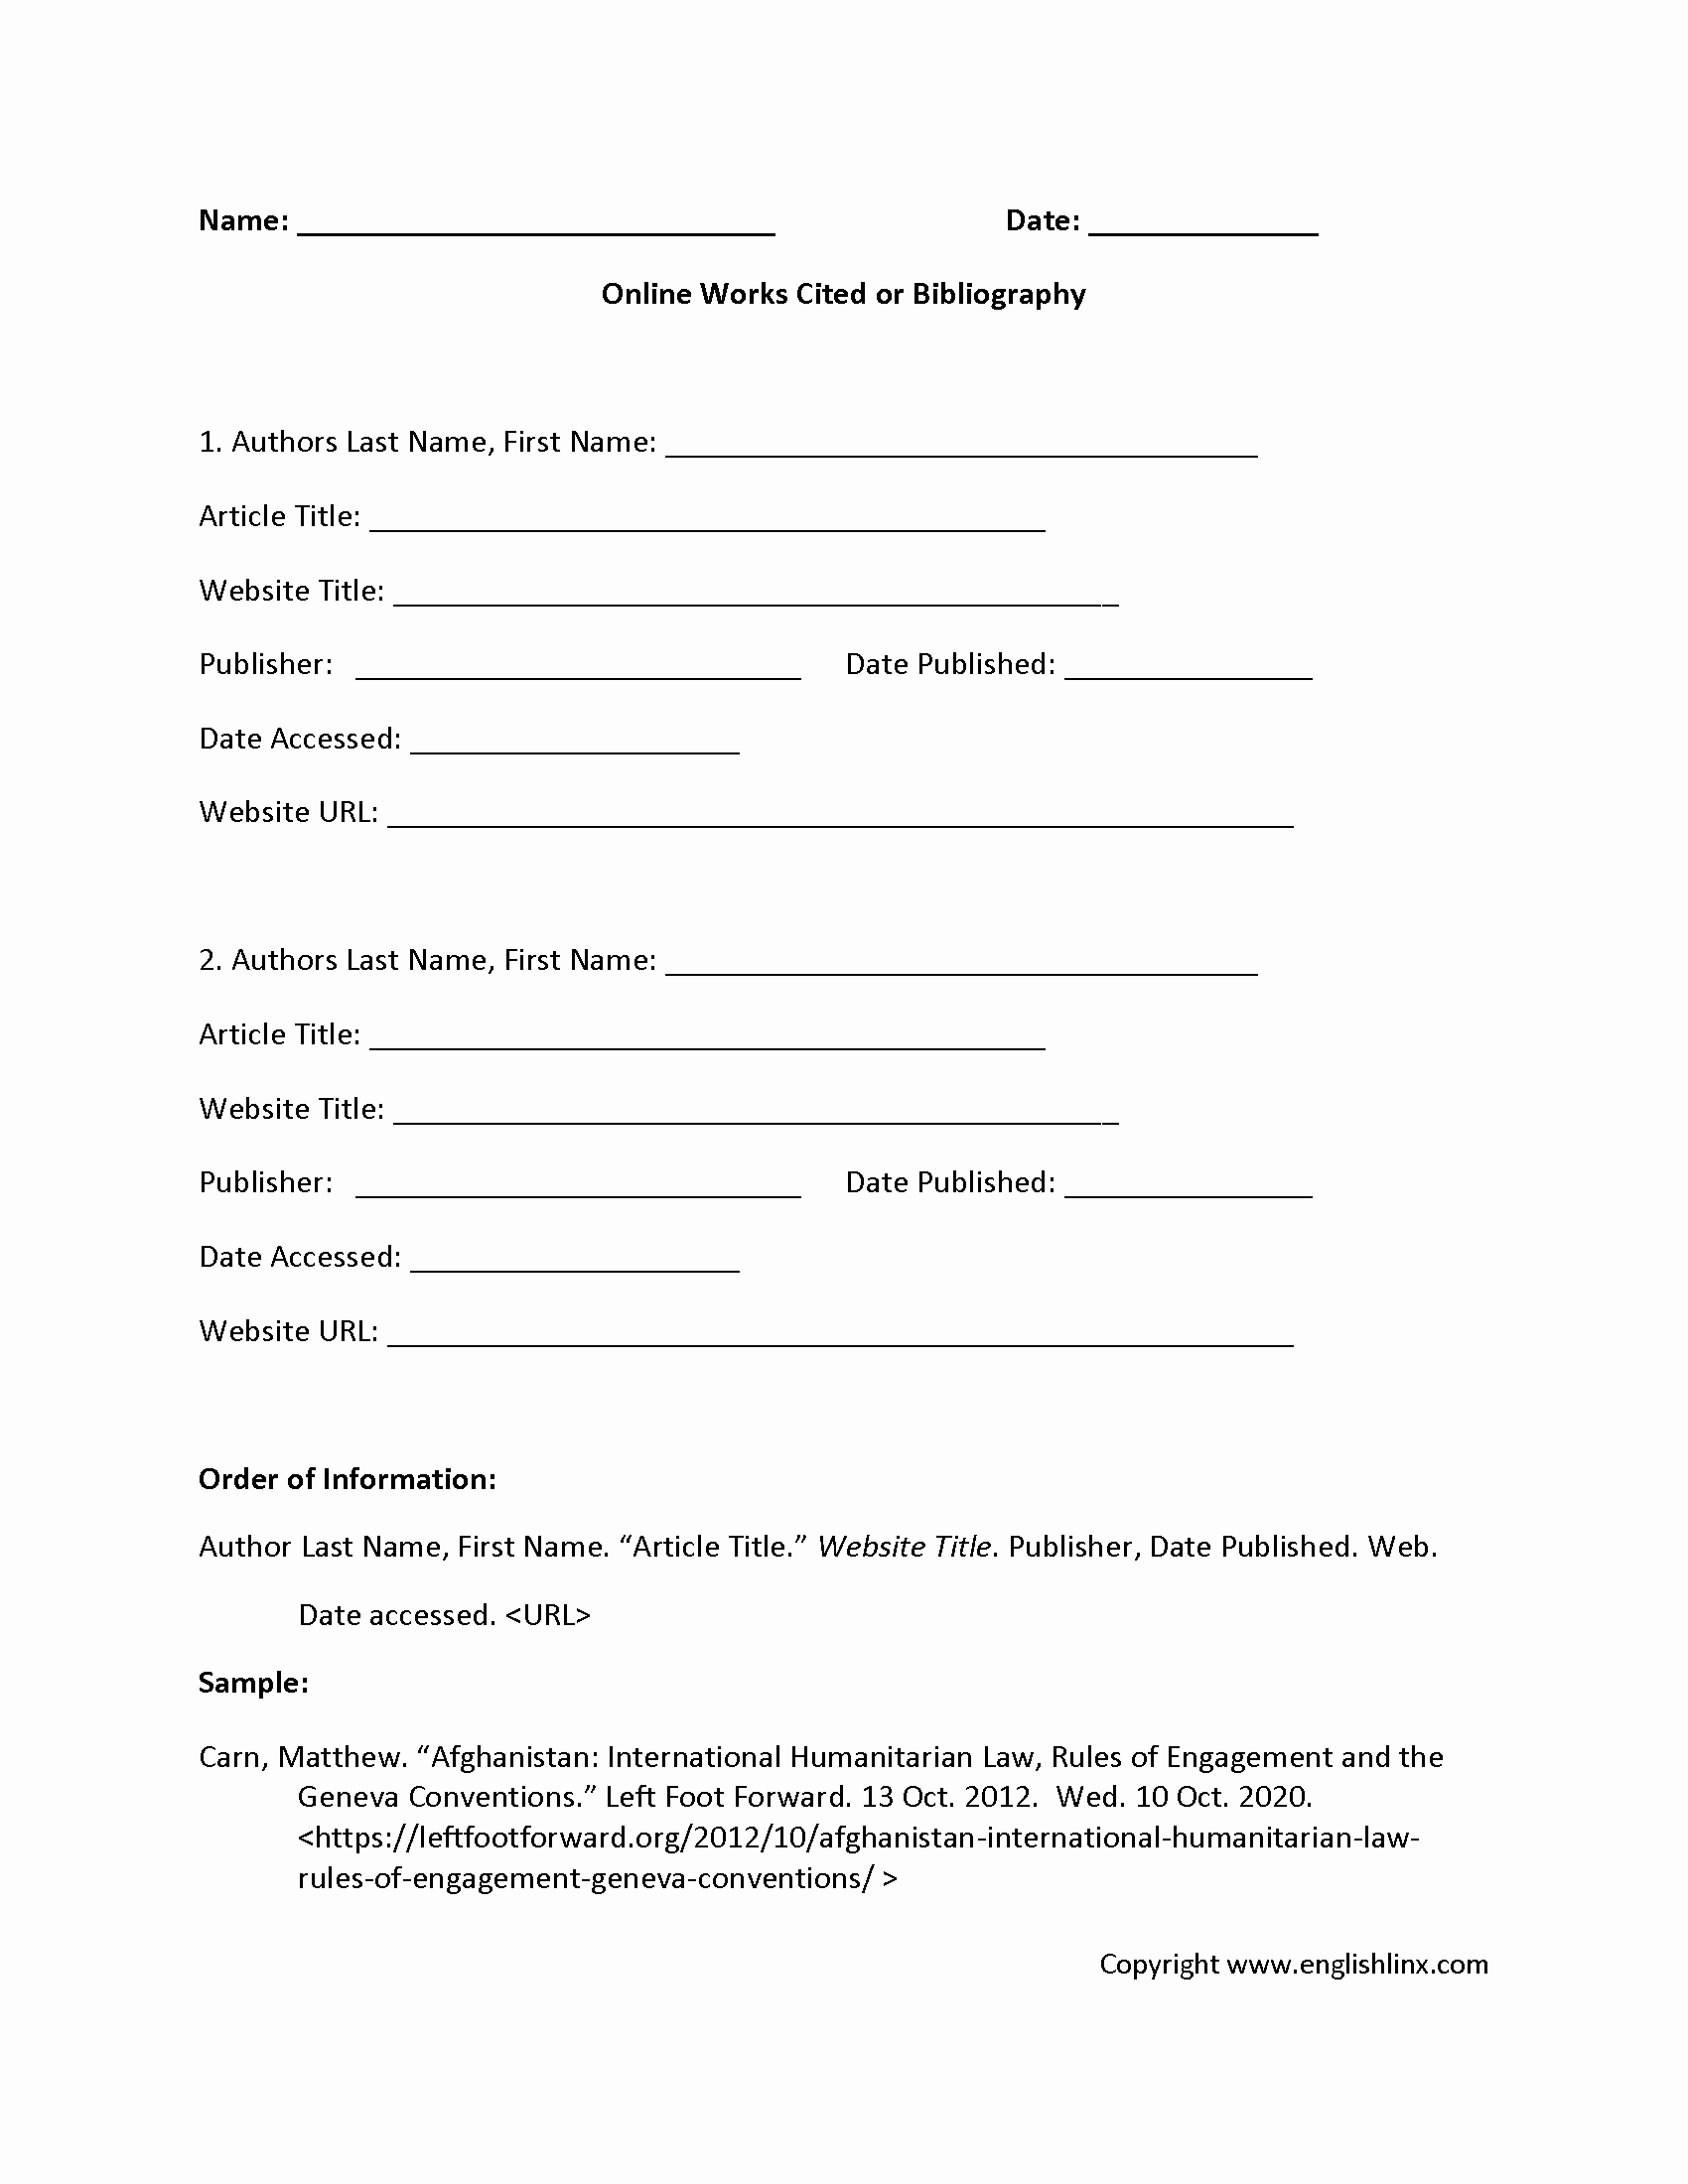 Bibliography Practice Worksheets Luxury Mla Works Cited Practice Worksheet